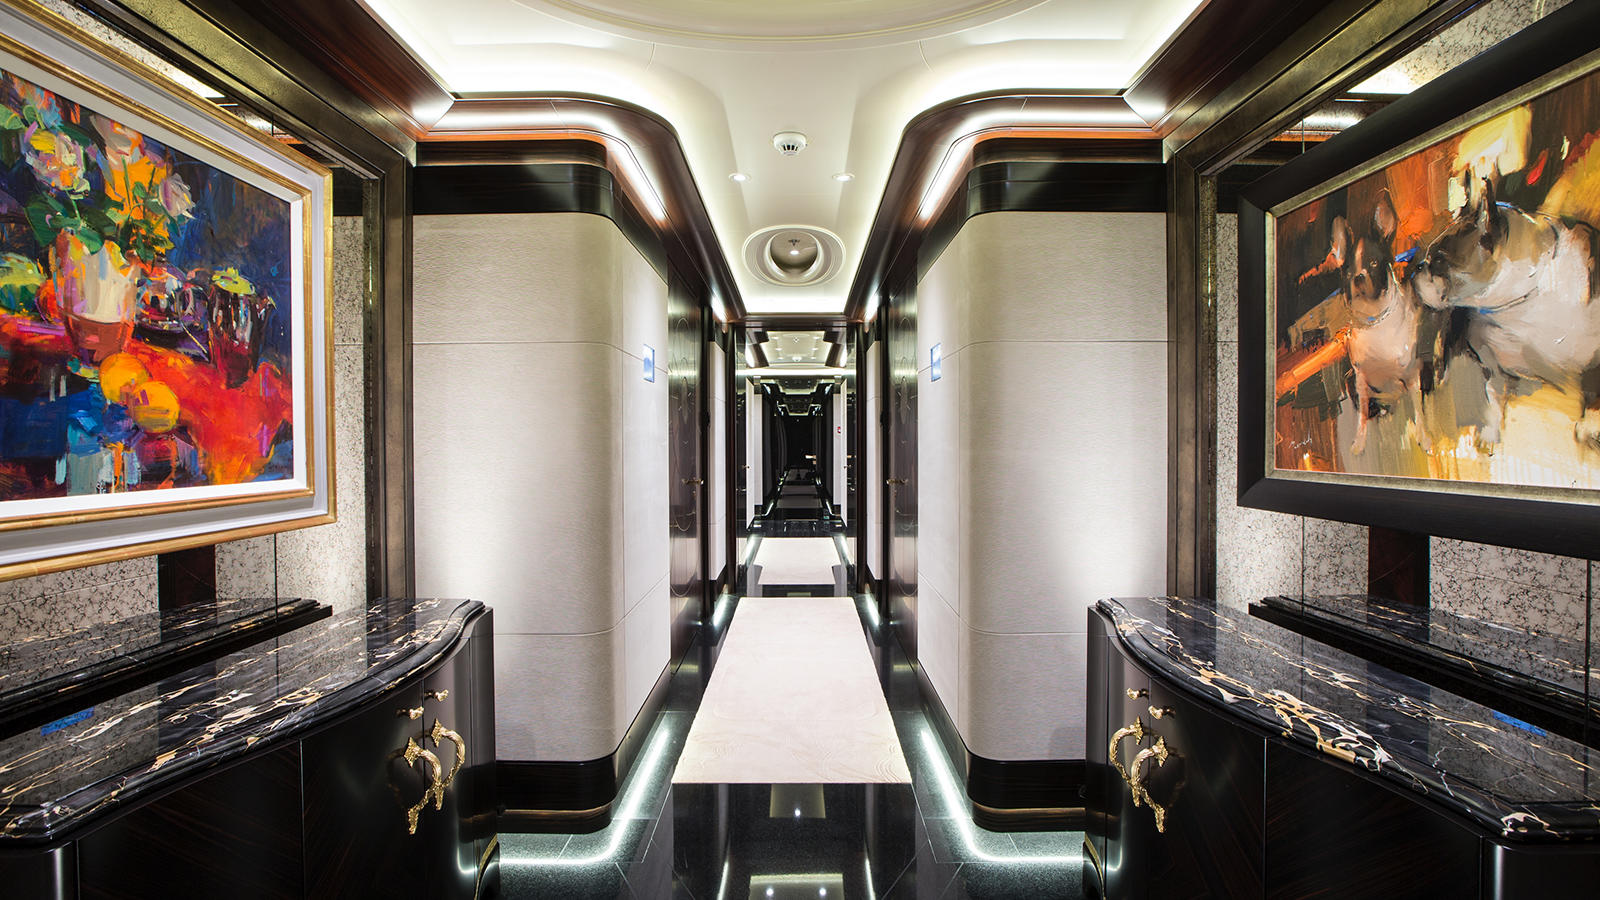 zv6cYVYSQ6eg1vVZAsP2_Kismet-super-yacht-lurssen-shahid-khan-95-metres-credit-guillaume-plisson-corri